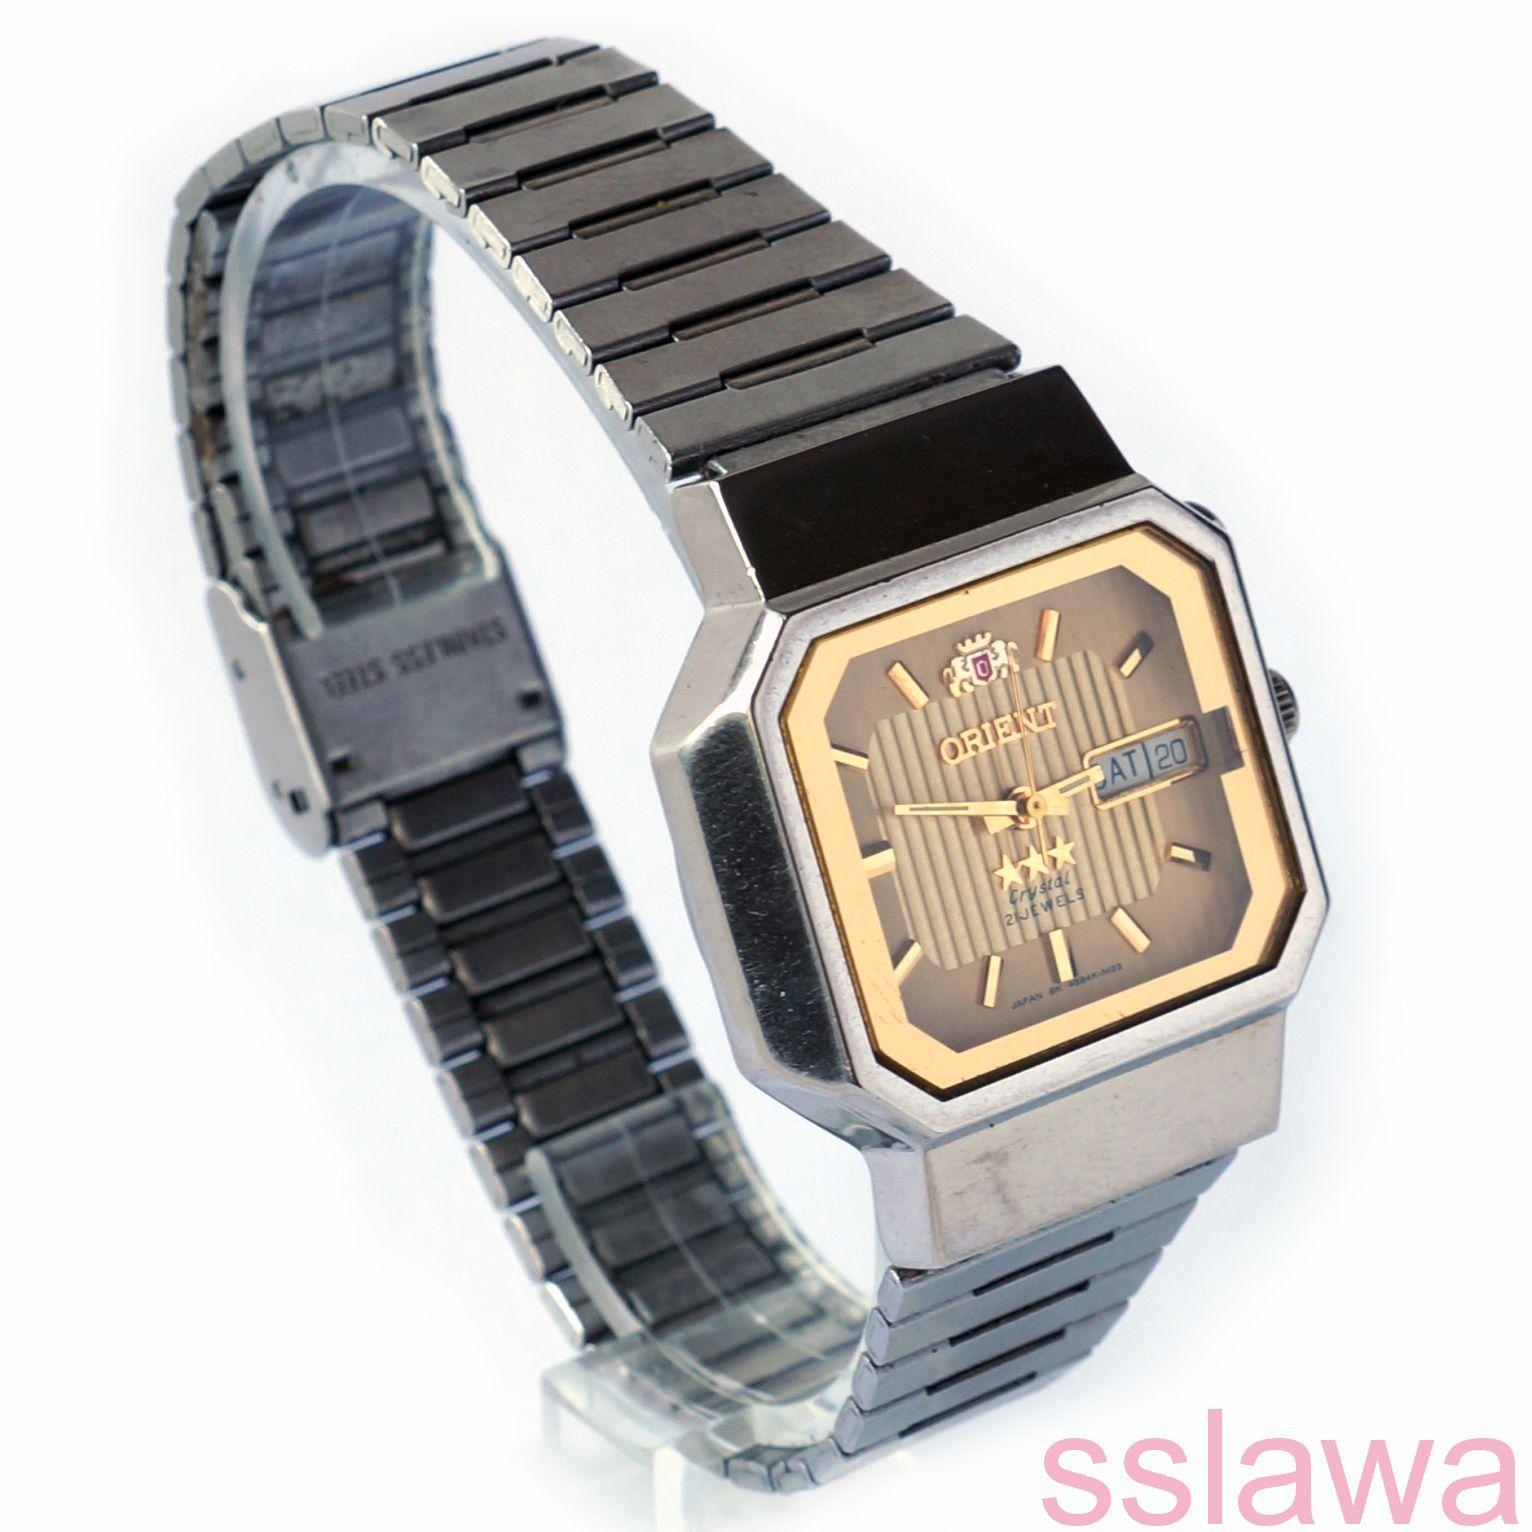 d65d8308 часы Ориент Фреза автоподзавод дата день недели Orient automatic Japan  винтаж #Япония #автоподзавод #